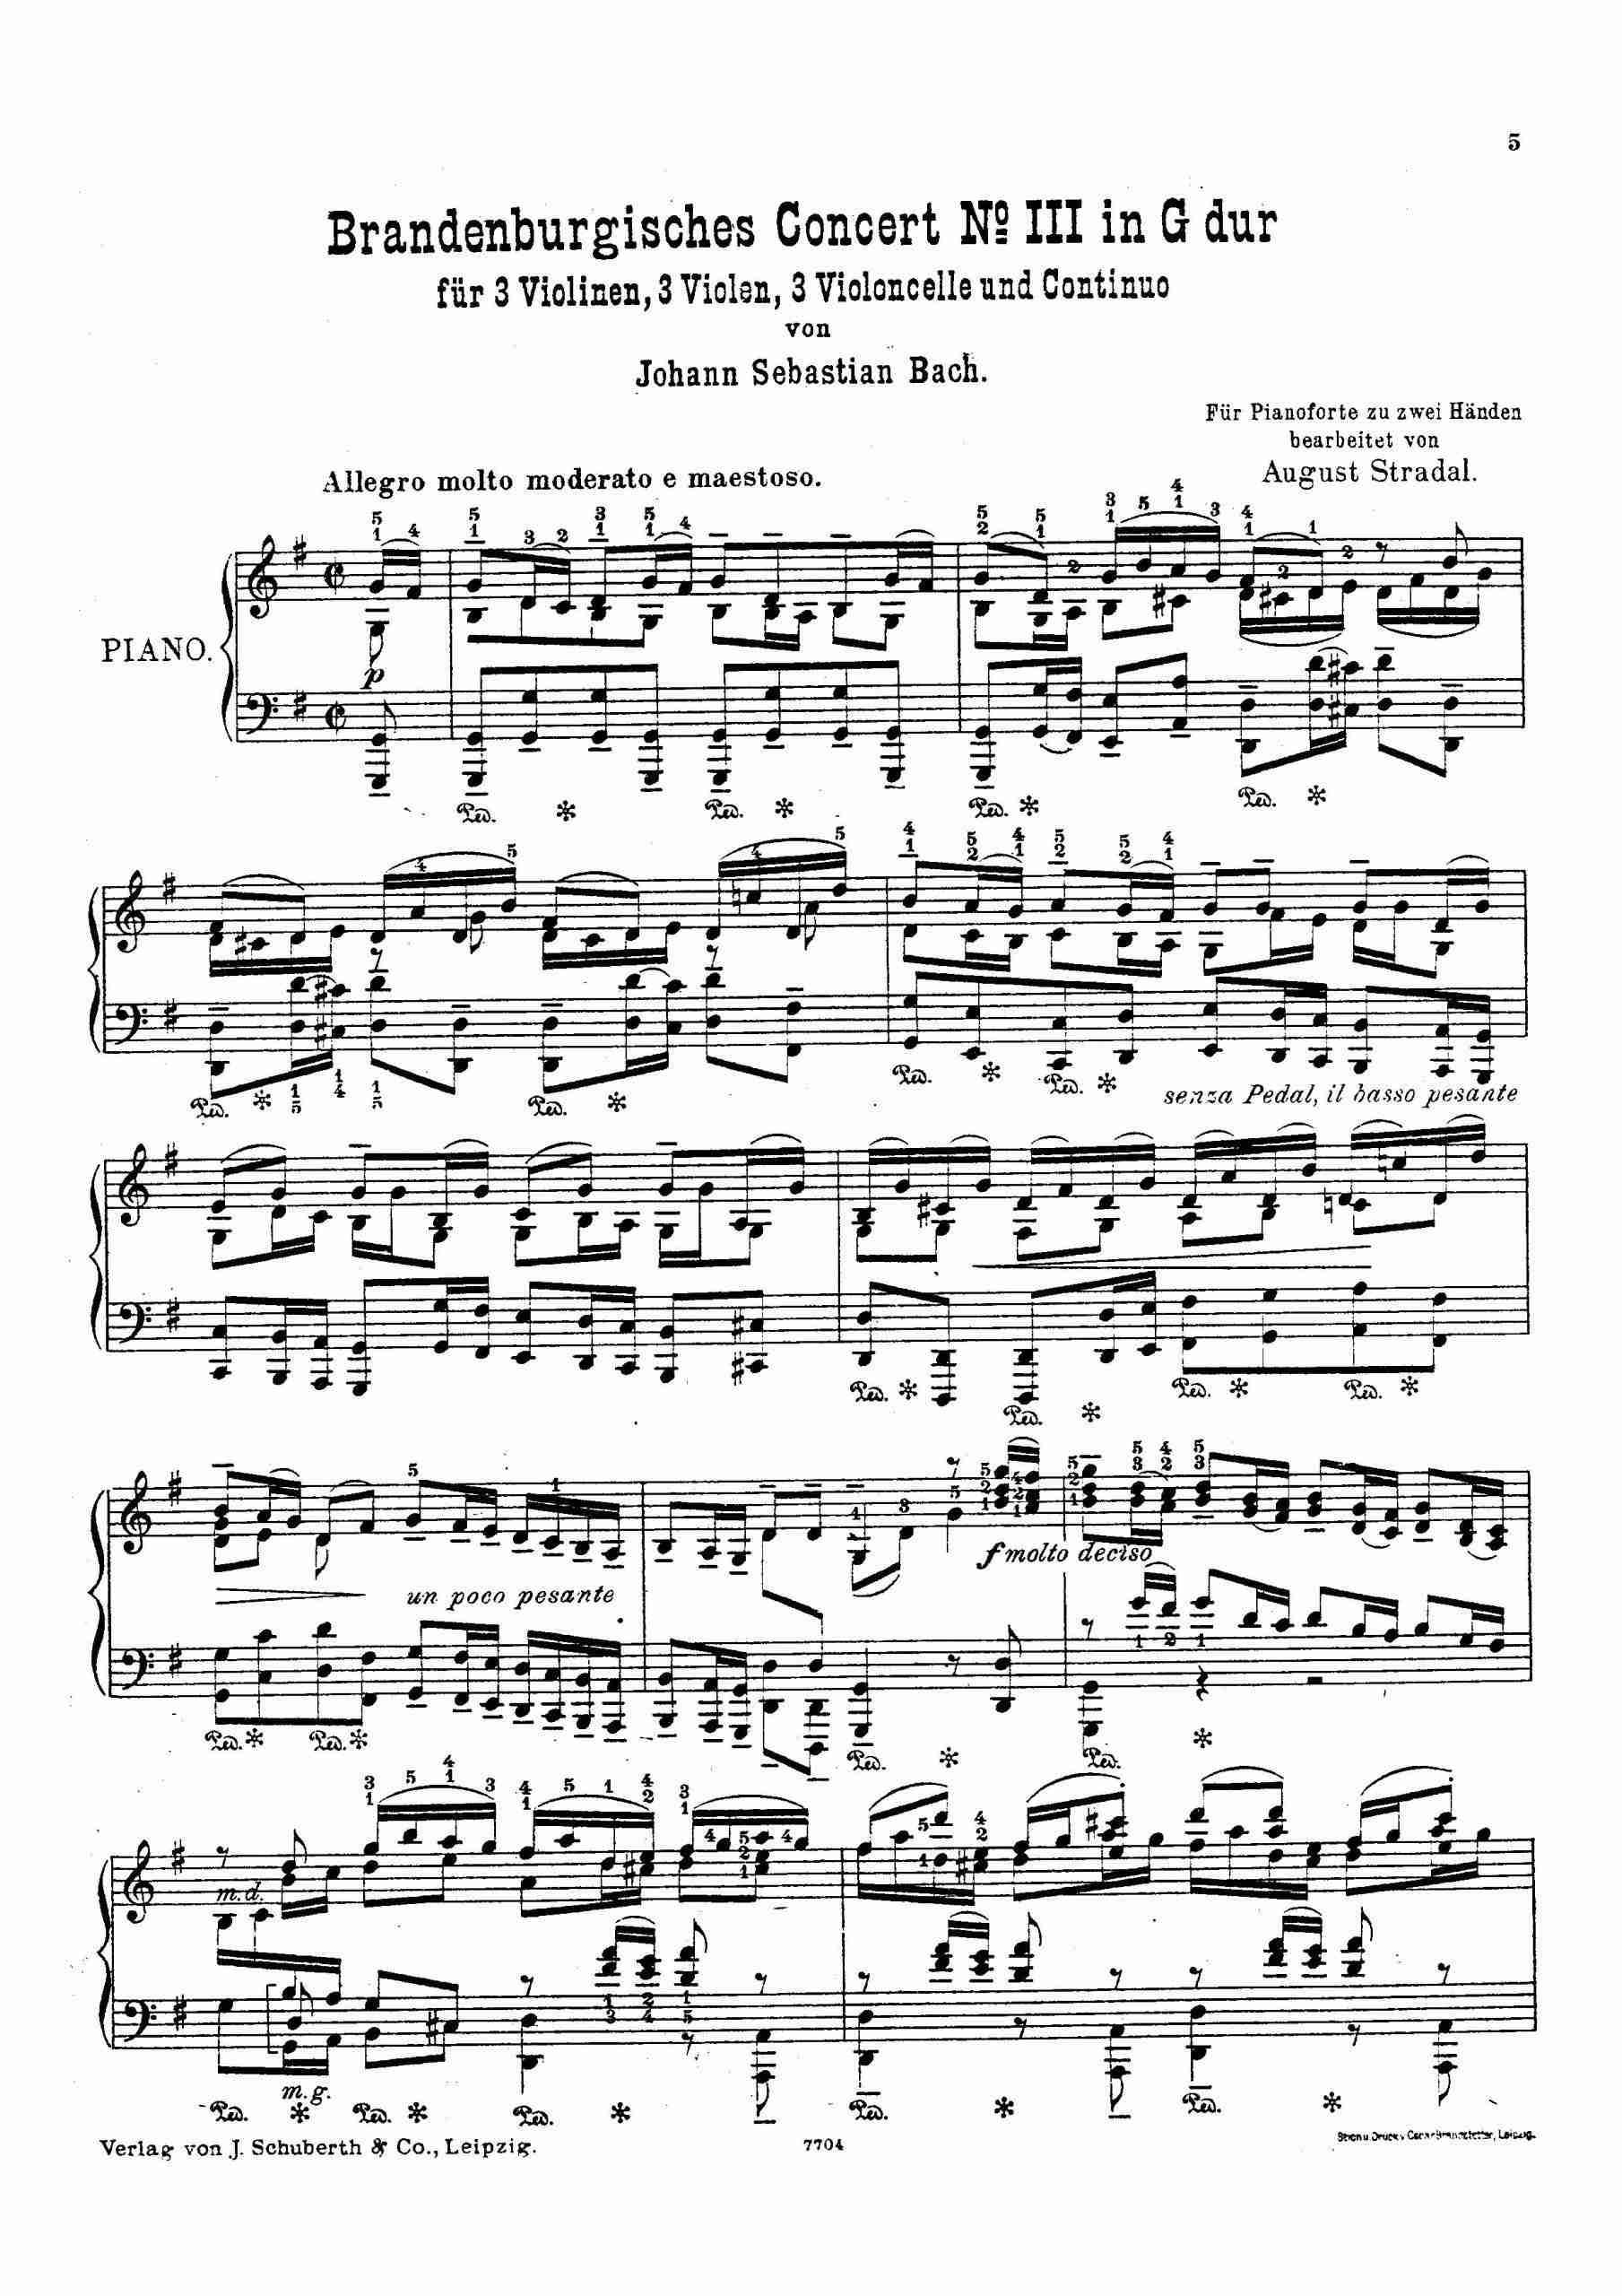 Bach - Brandenburg Concerto No.3 (arr. Stradal)